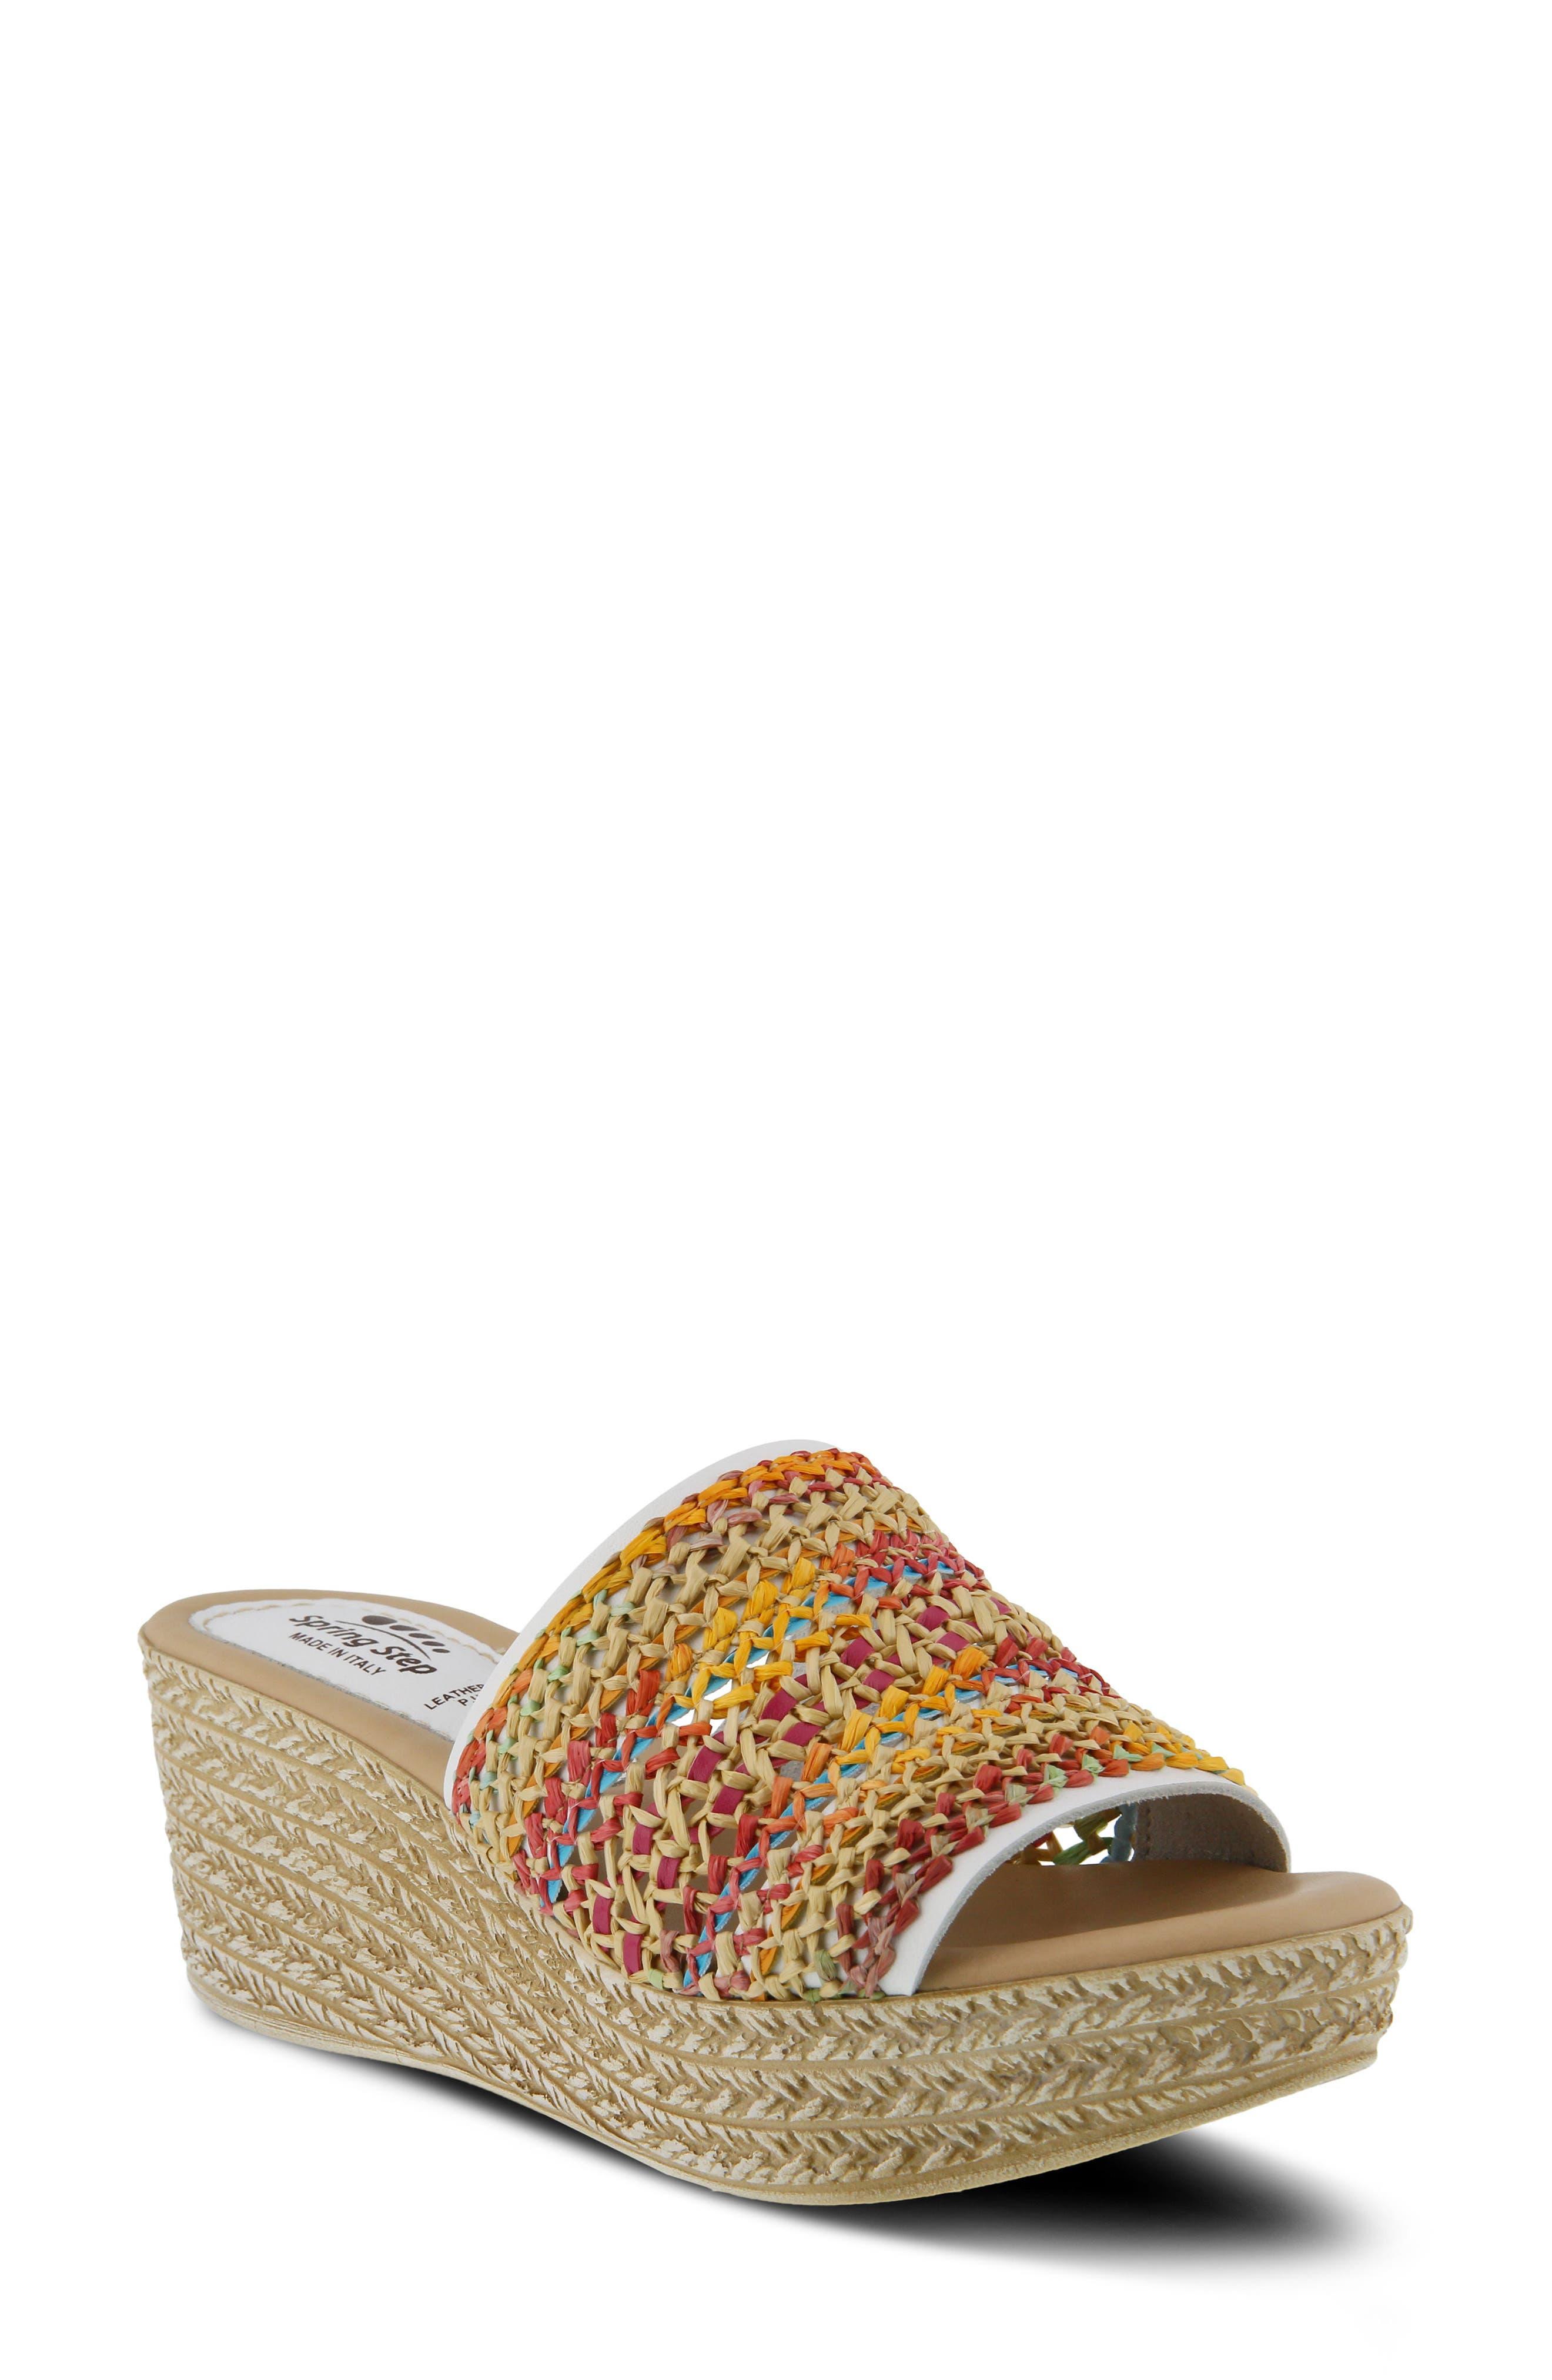 Calci Espadrille Wedge Sandal,                             Main thumbnail 1, color,